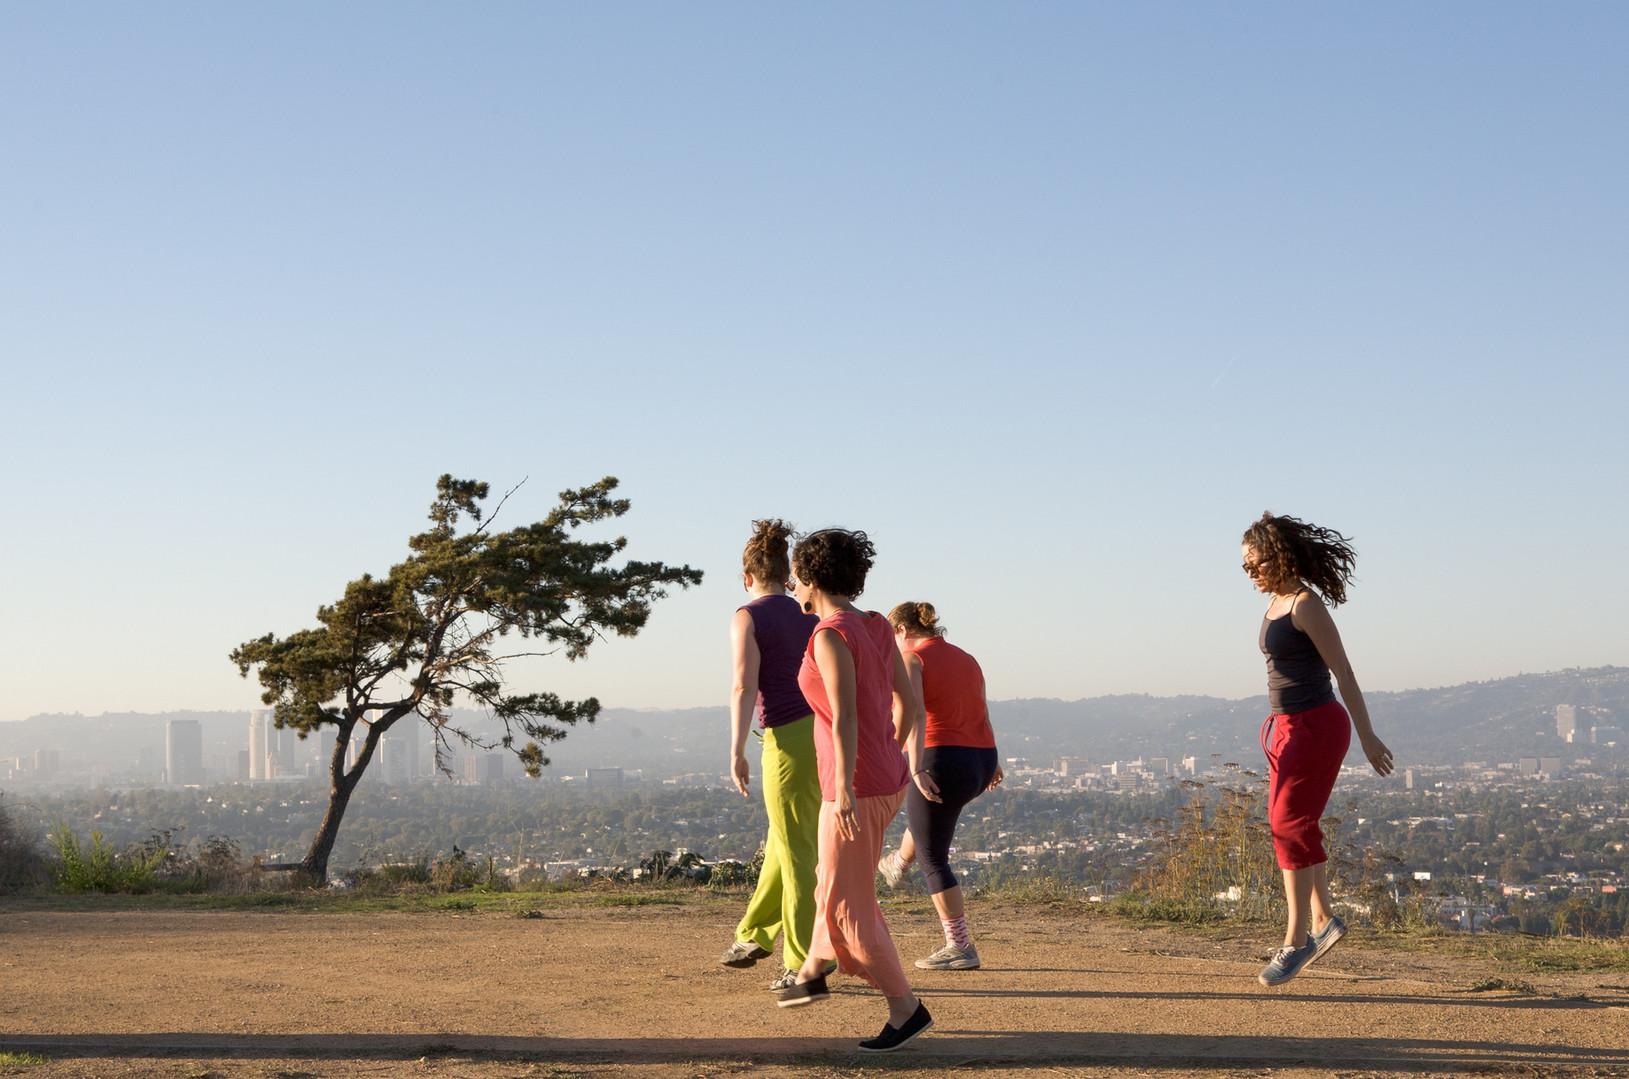 Dancing in Public Parks, 2010